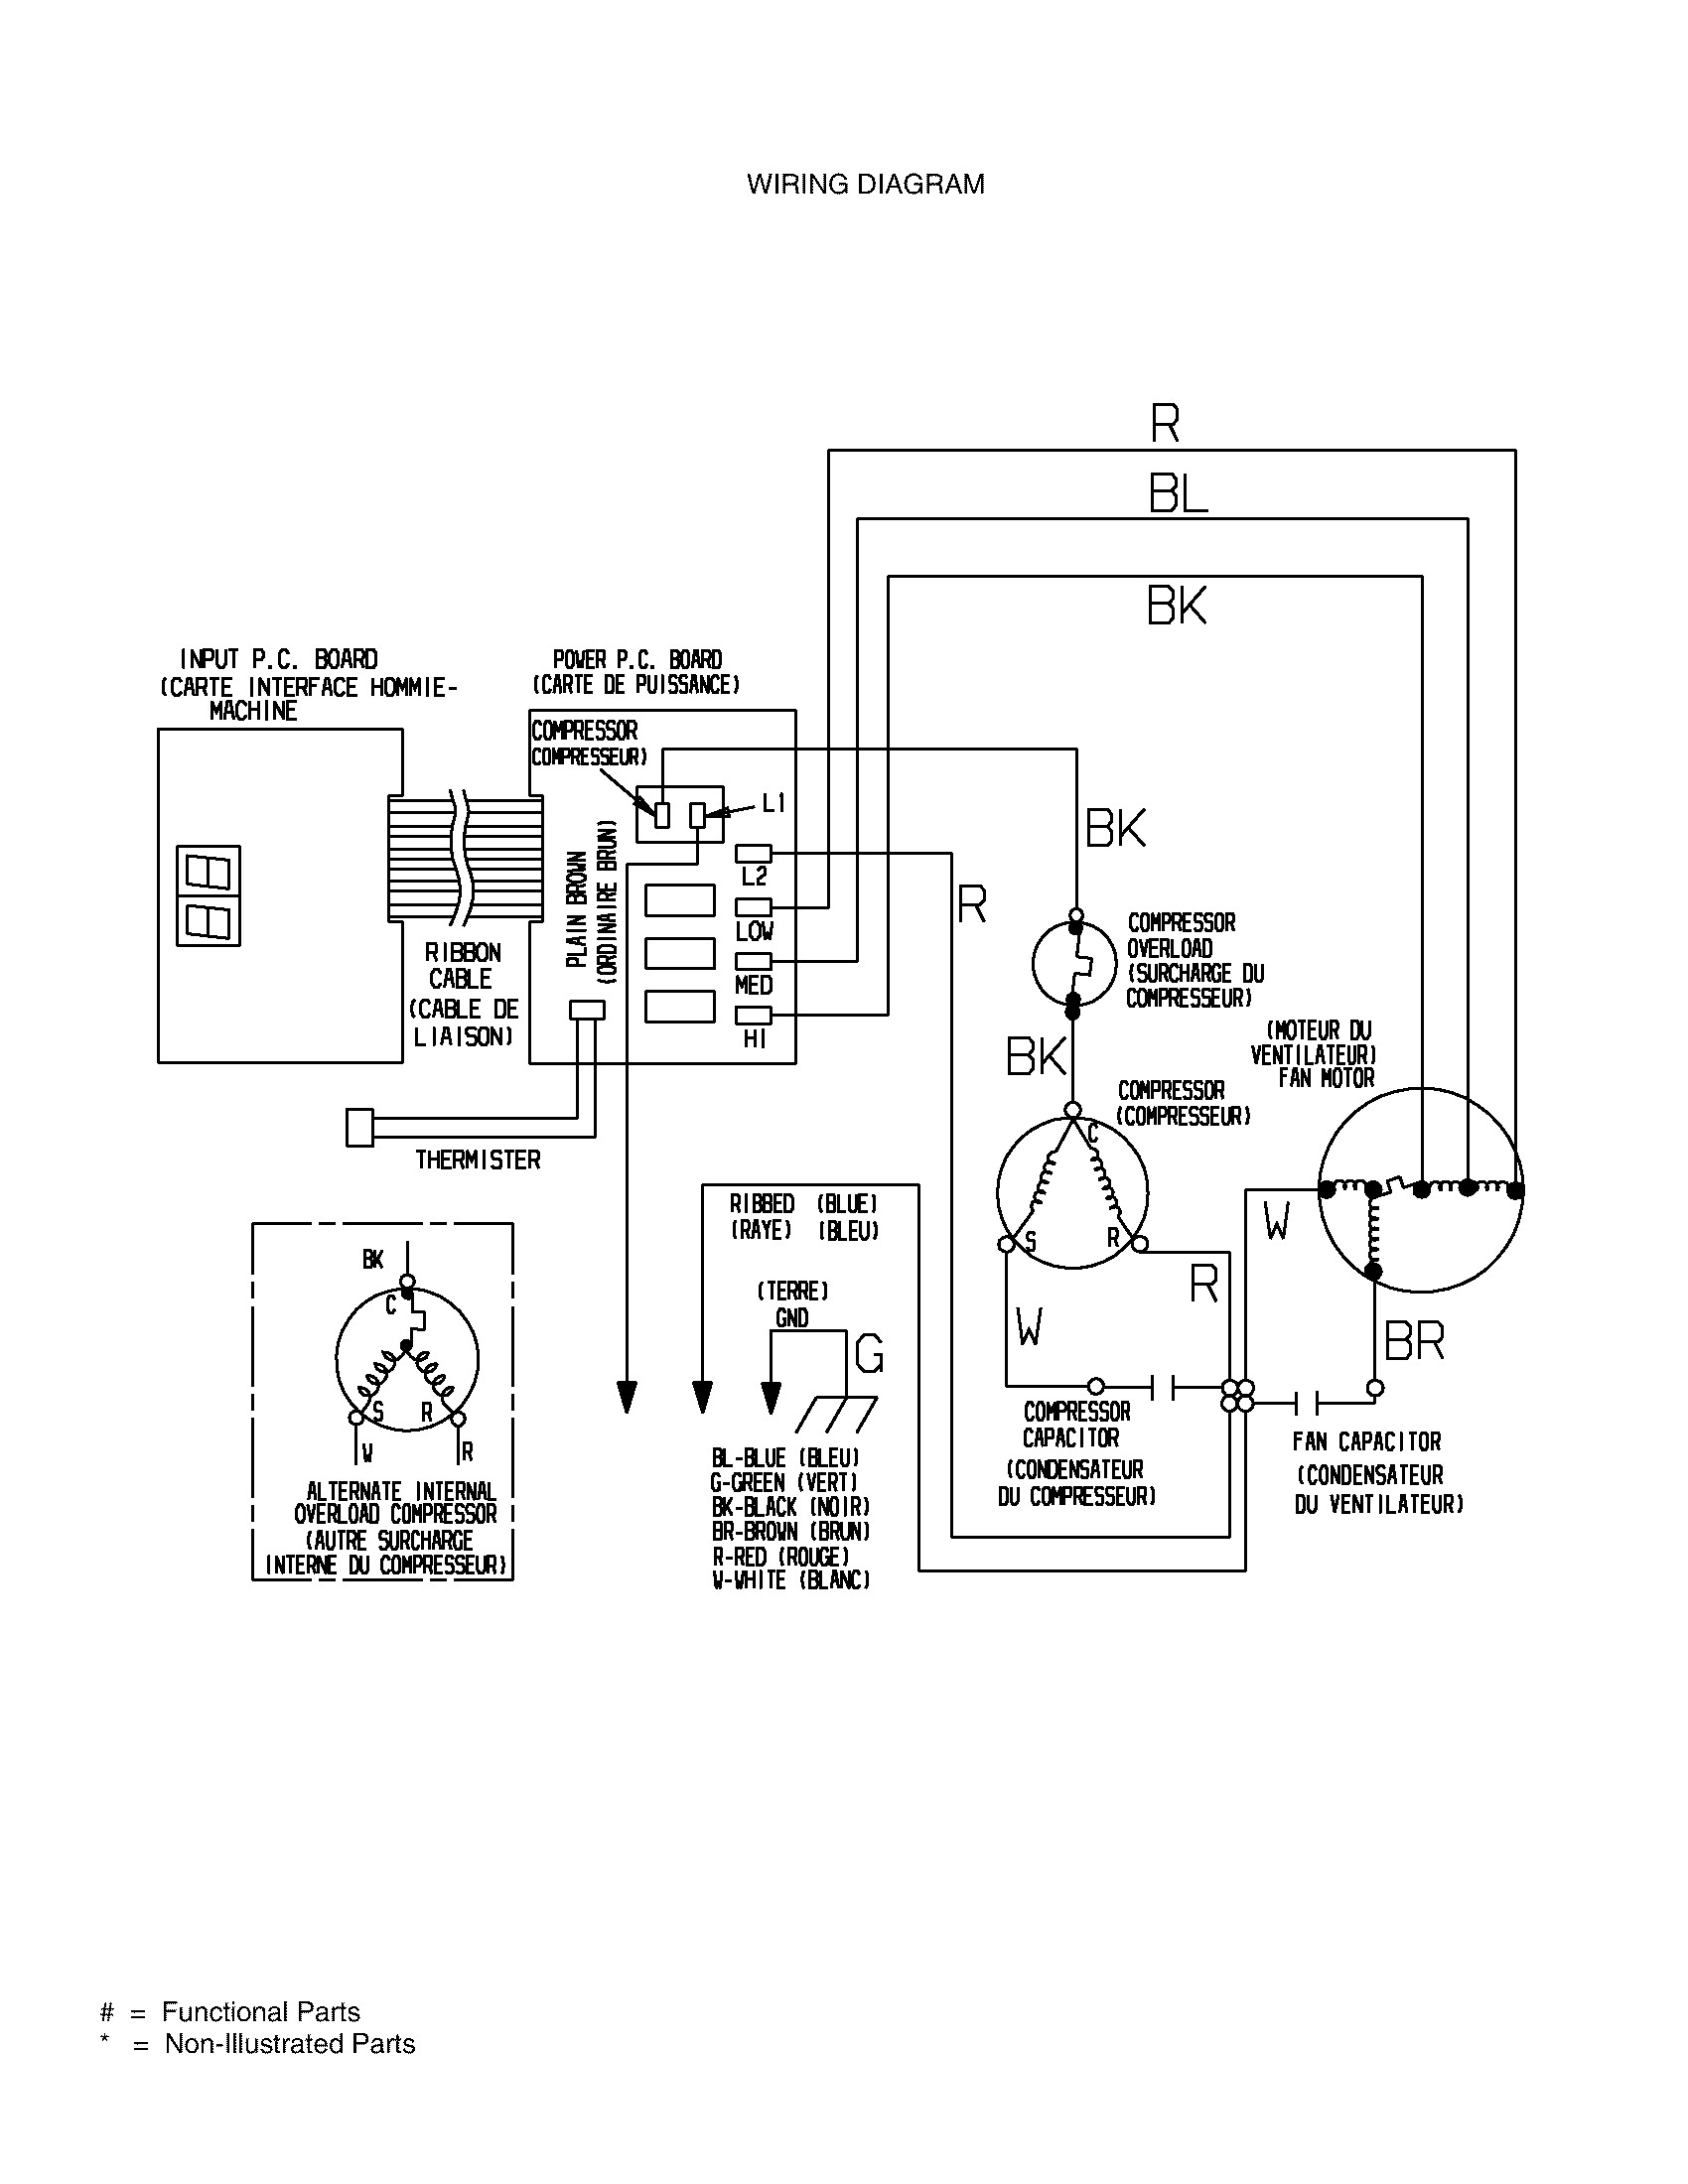 hight resolution of wrg 1374 xe 1200 fan motor wiring diagram bunch ideas wiring diagram trane split system